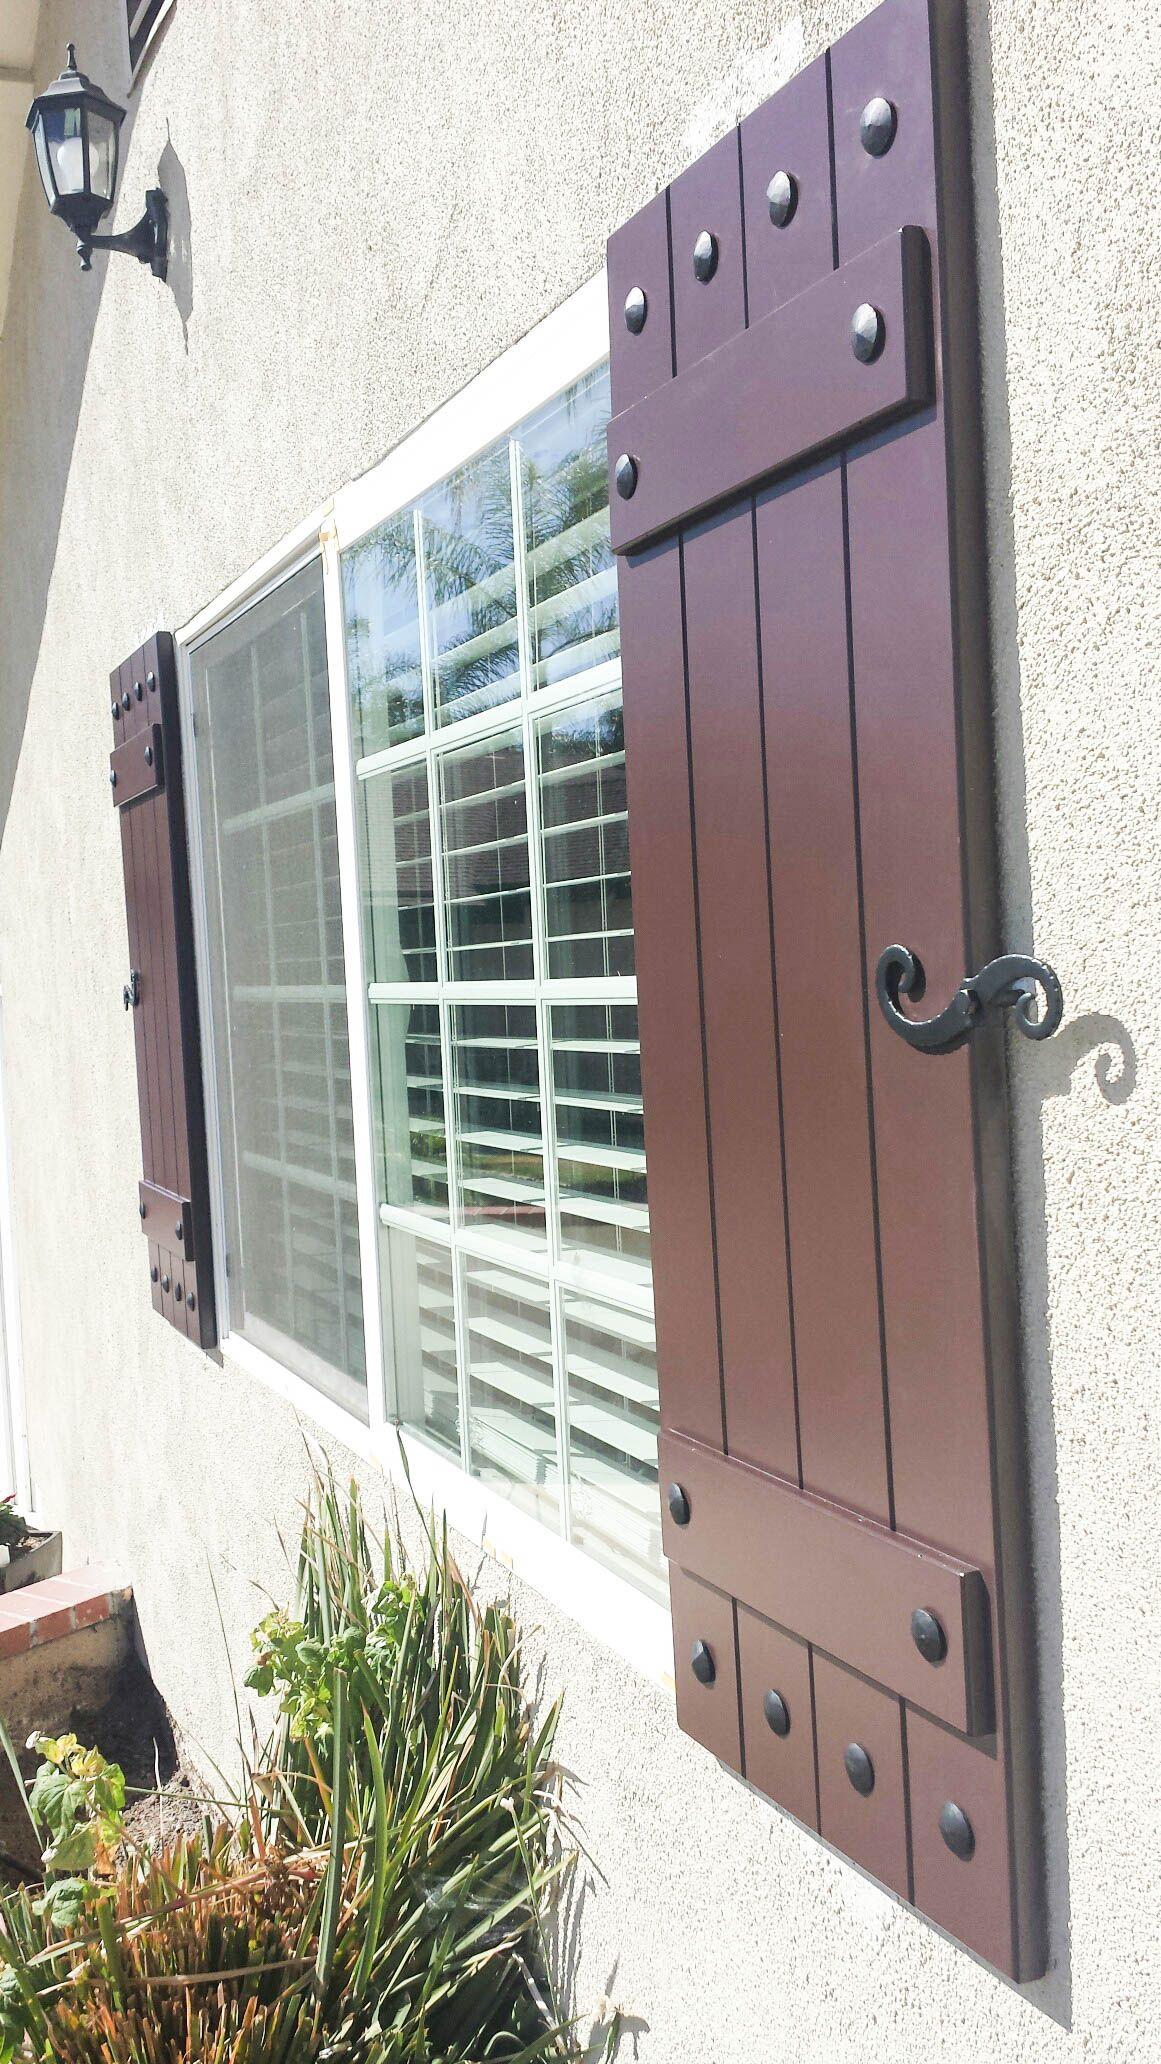 Wrought Iron Exterior Window Shutters Metal Wall Art Window Shutters Exterior Windows Exterior Shutters Exterior